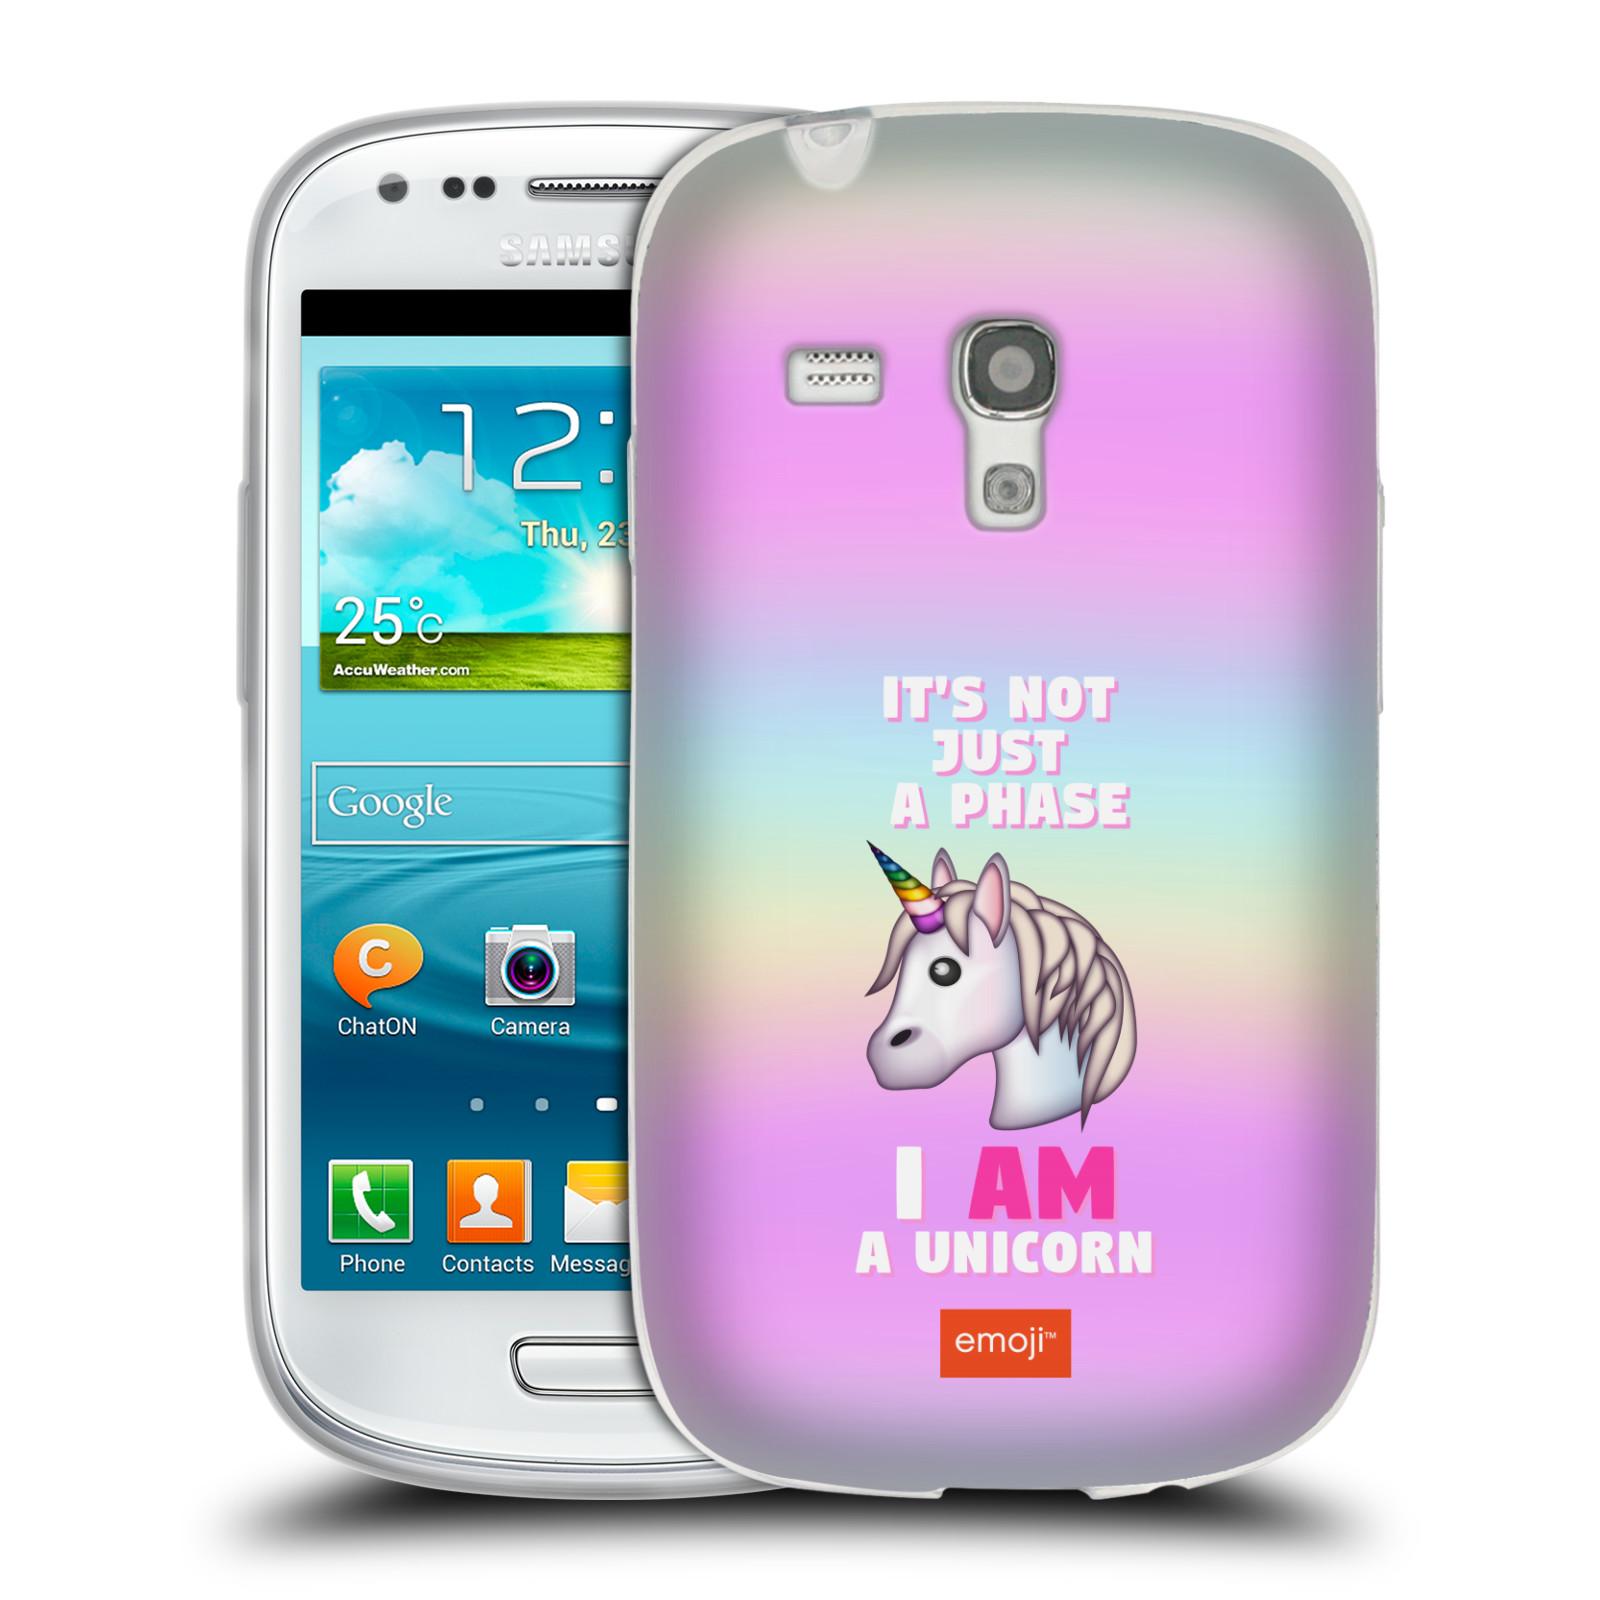 HEAD CASE silikonový obal na mobil Samsung Galaxy S3 MINI smajlíci  oficiální kryt EMOJI vzor jednorožec růžová I AM UNICORN 0b0604cfea8